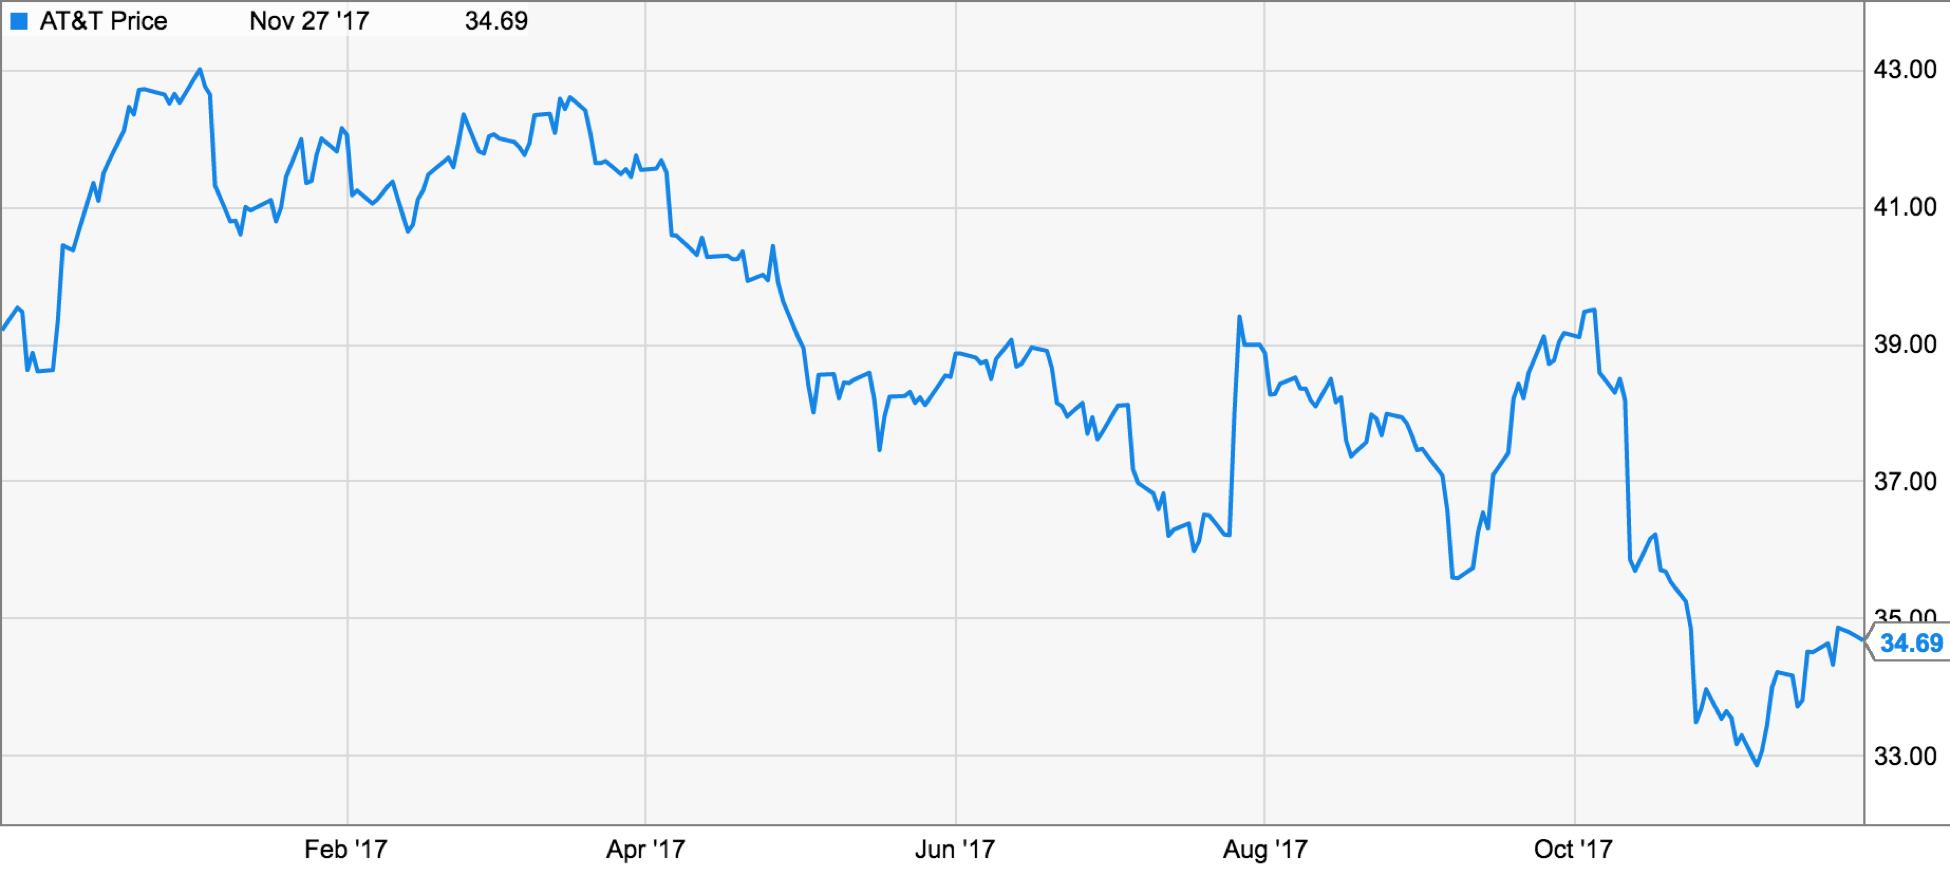 At&t Stock Quote Doj Impact On At&t  At&t Incnyset  Seeking Alpha